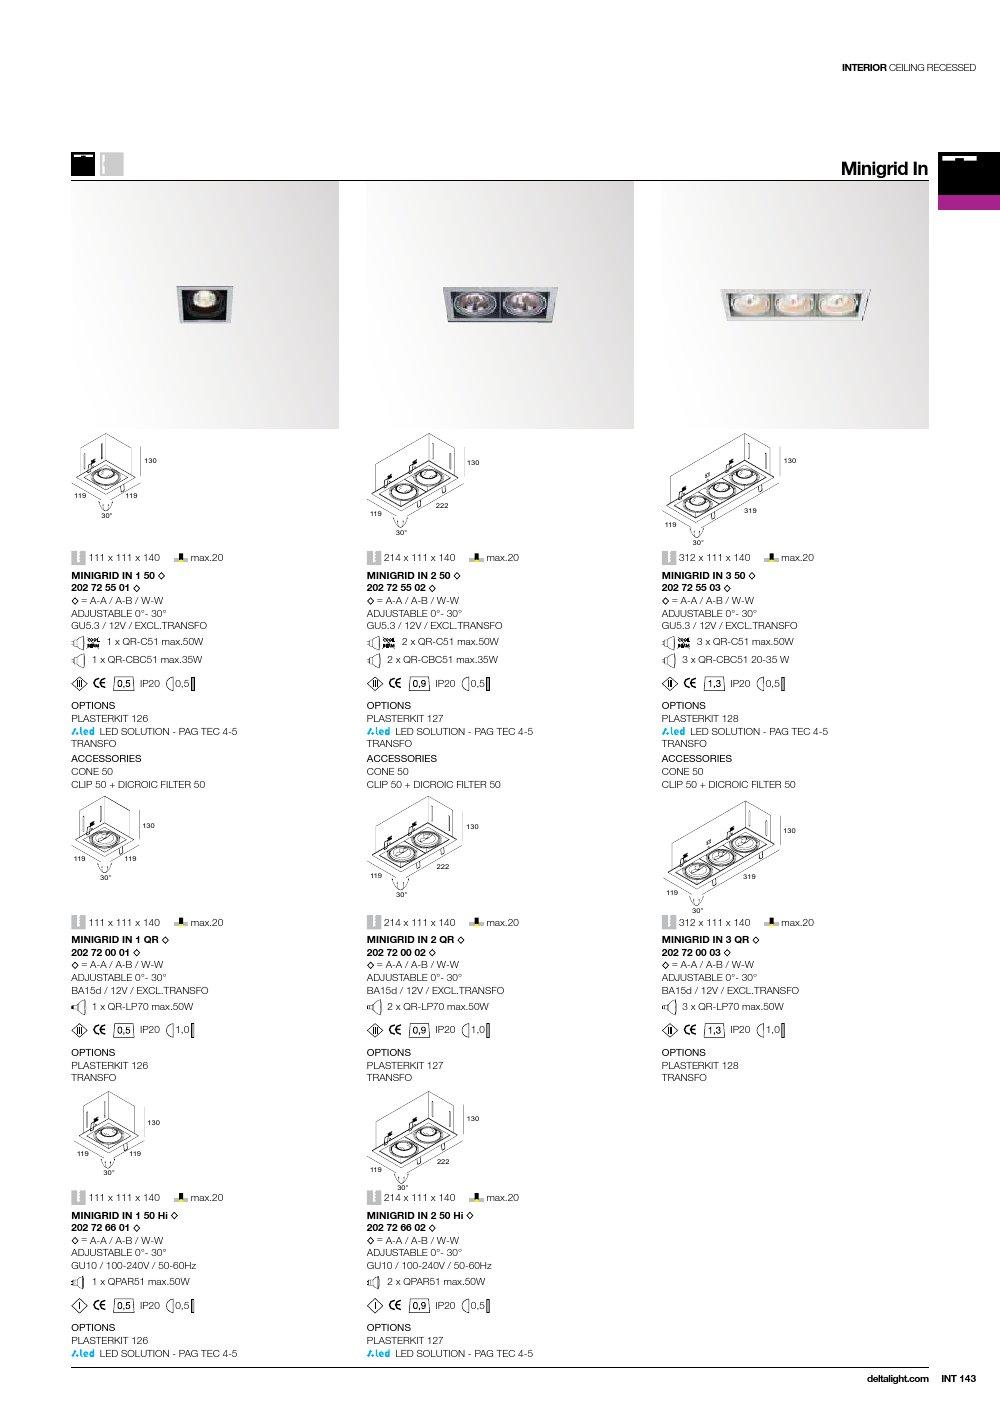 Minigrid in 2 50 hi Frames Empotrables GU10 2x50w Aluminio Negro Delta Light Foto